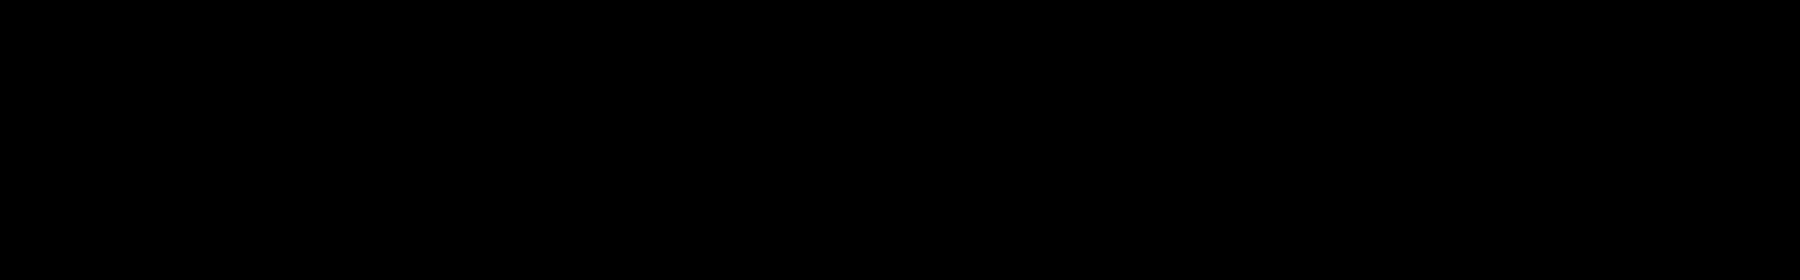 AAA Game Character Demon audio waveform